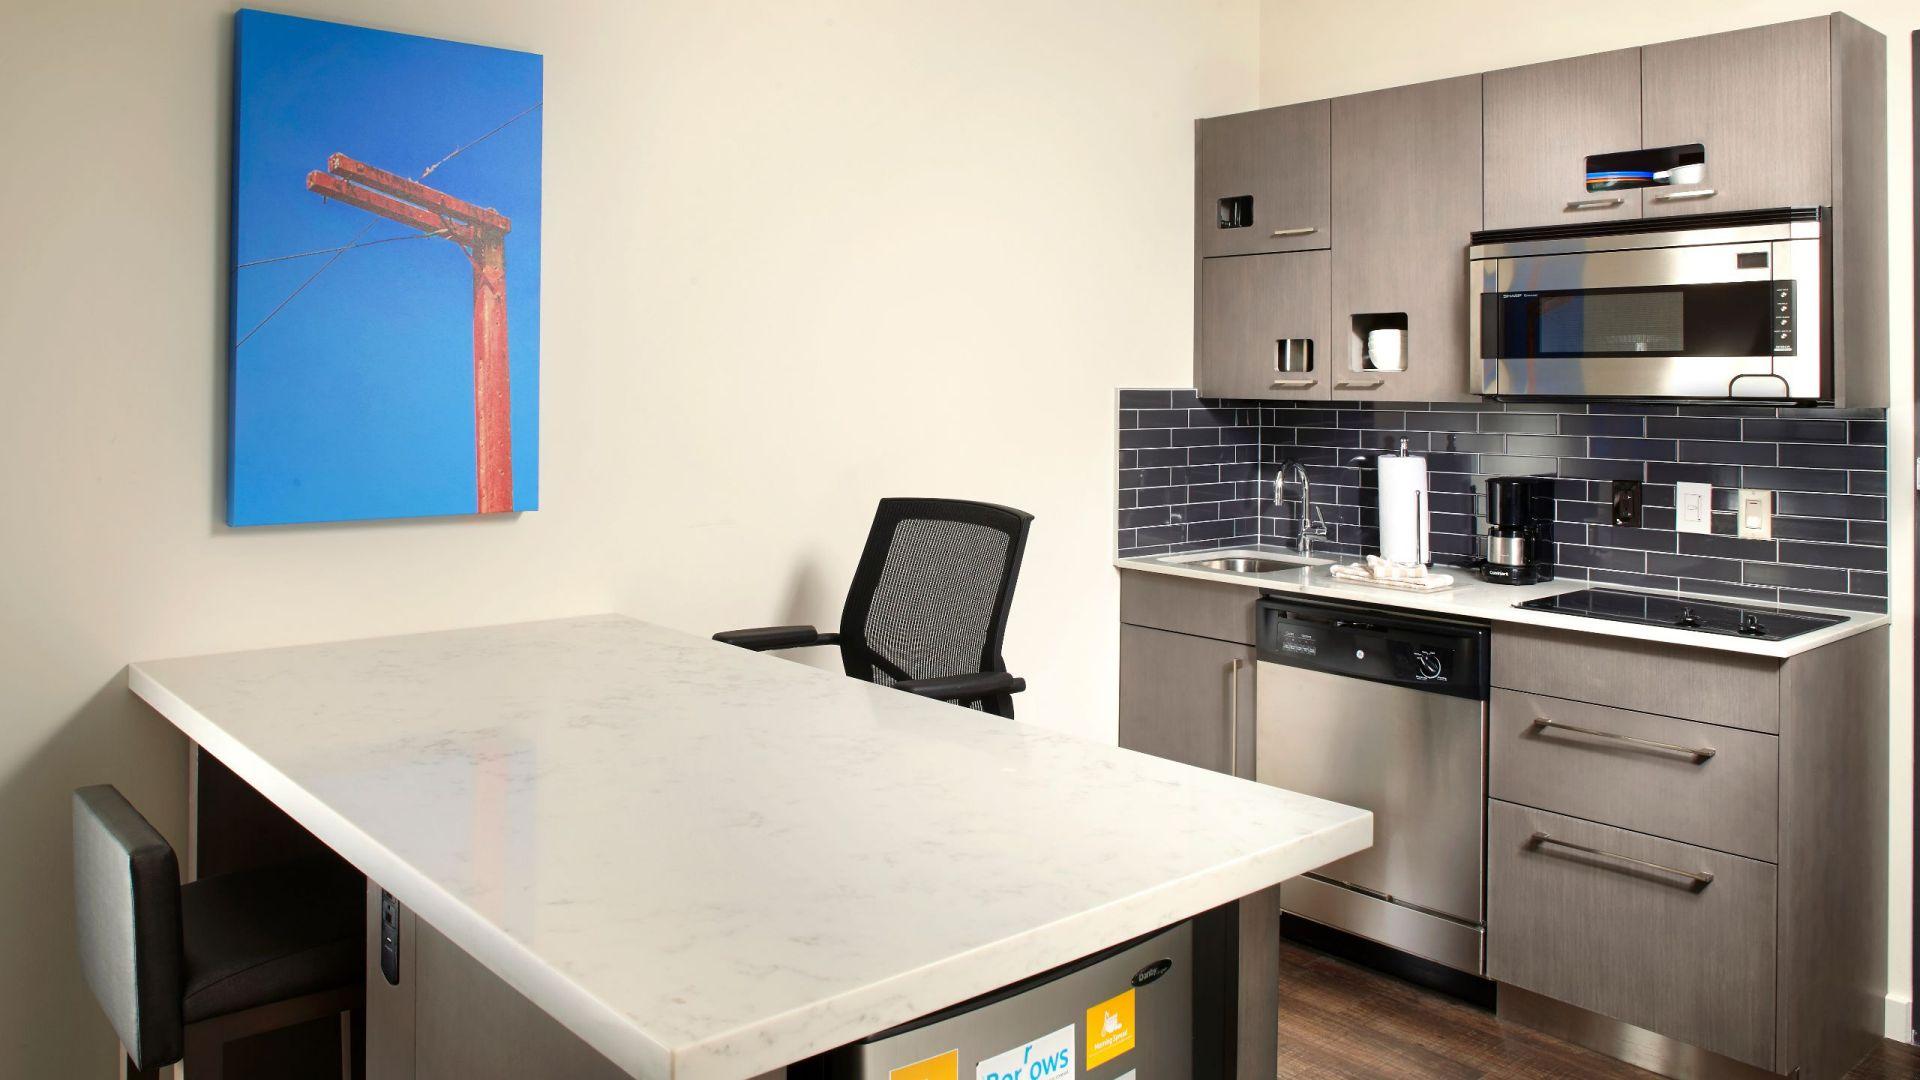 Hyatt House Studio Kitchen